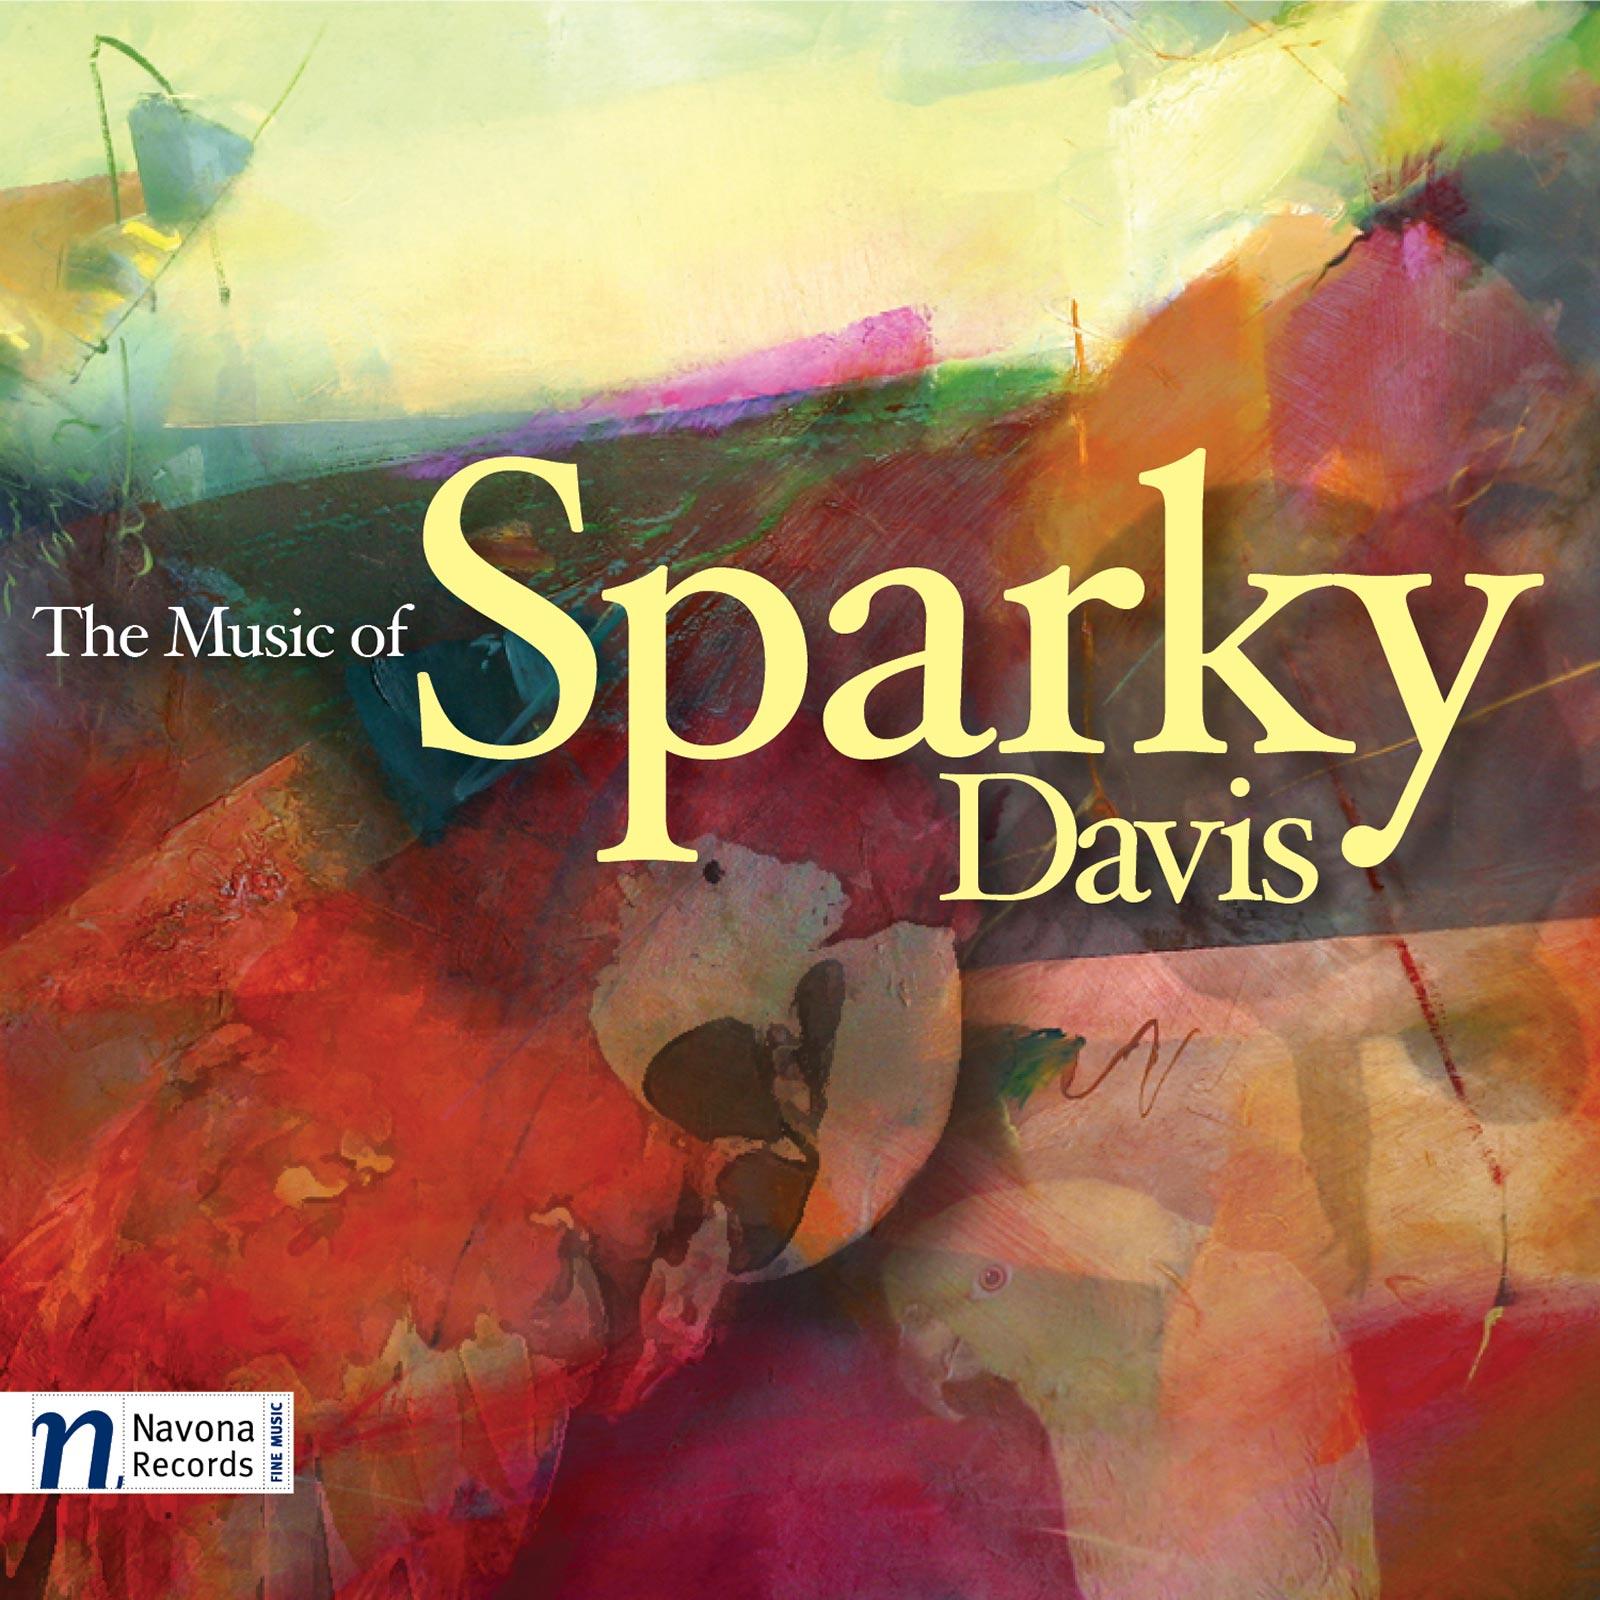 The Music of Sparky Davis